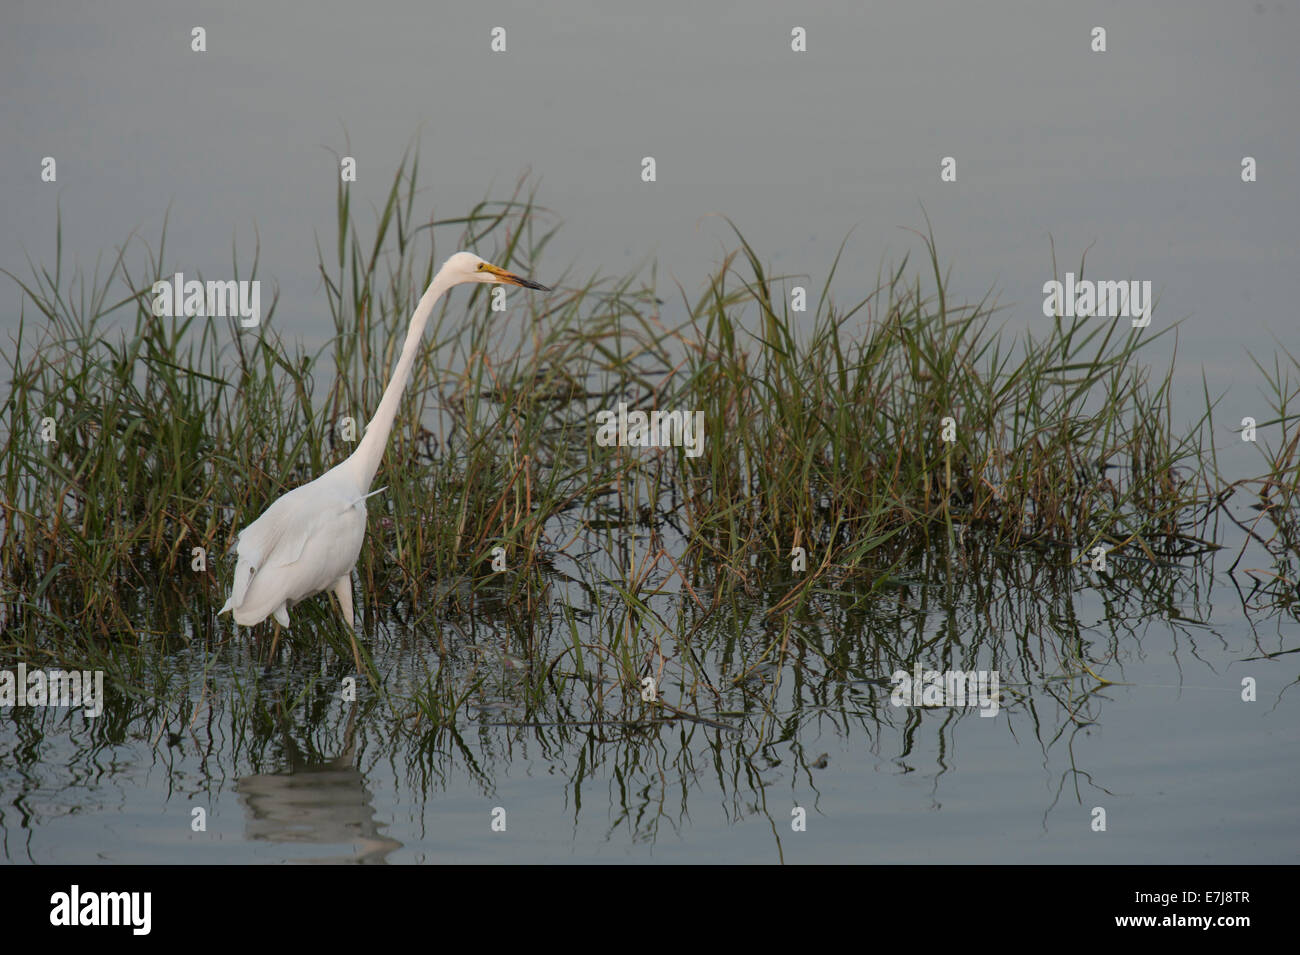 Great Egret, Ardea alba, Ardeidae, Japur, Rajasthan, India, Asia - Stock Image